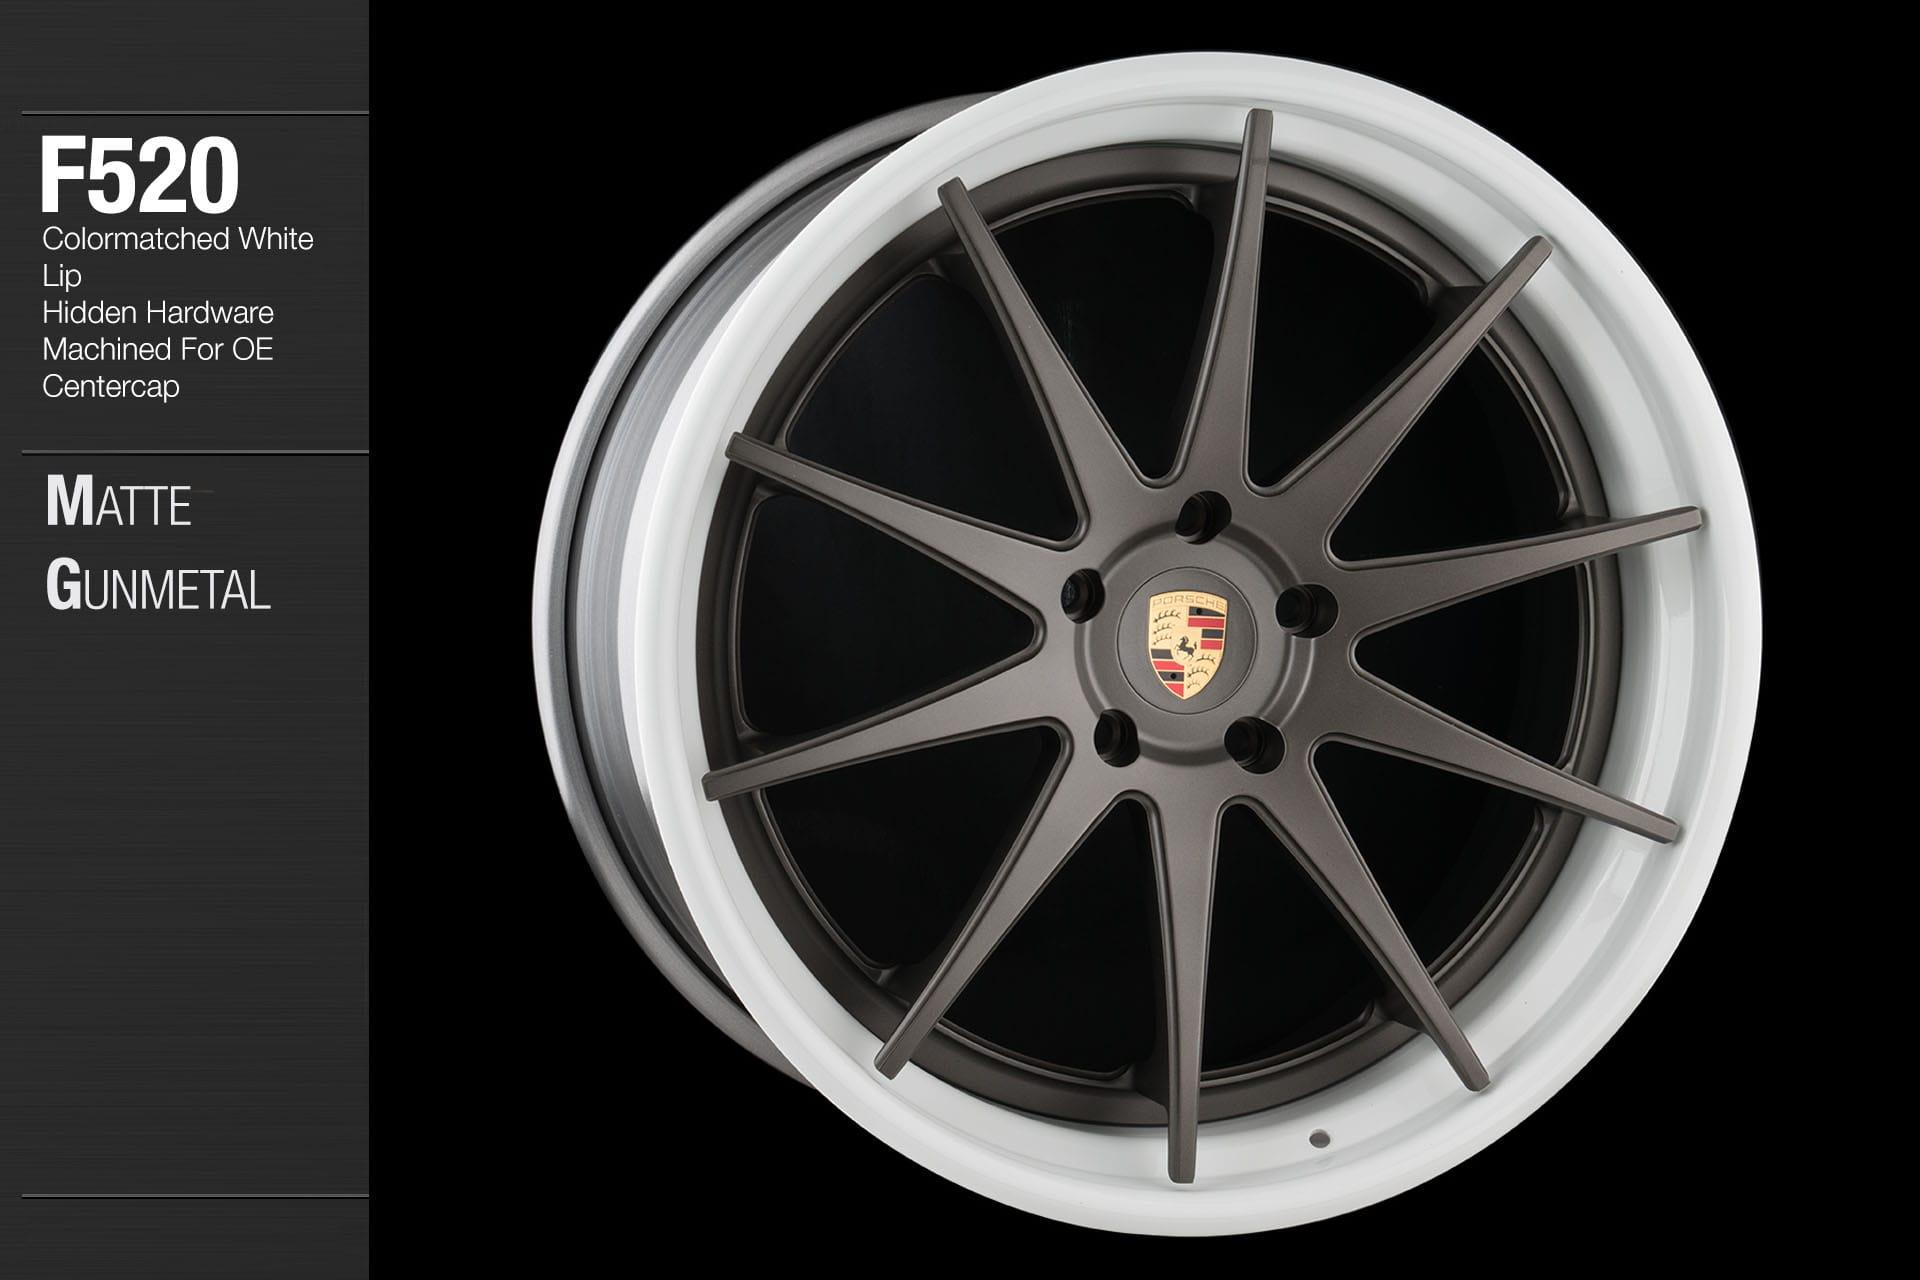 avant-garde-ag-wheels-f520-matte-gunmetal-face-colormatched-white-lip-hidden-hardware-machined-for-oe-centercap-4-min